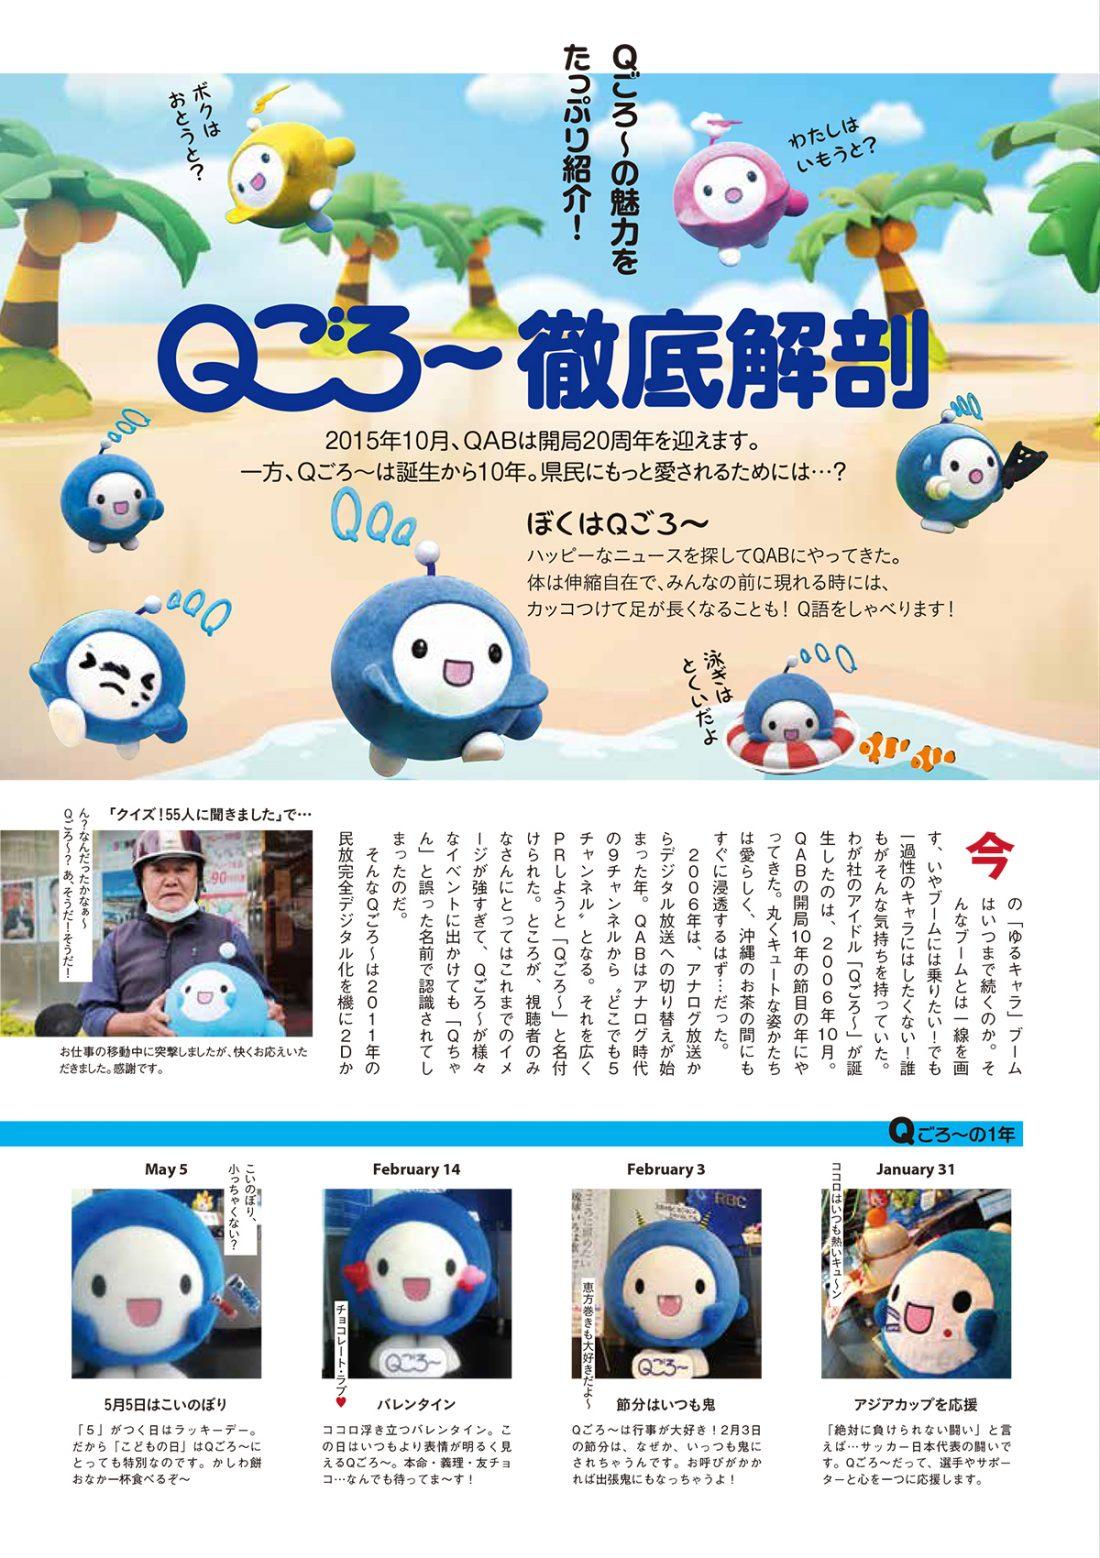 https://www.qab.co.jp/qgoro/wp-content/uploads/quun_0302-1100x1558.jpg